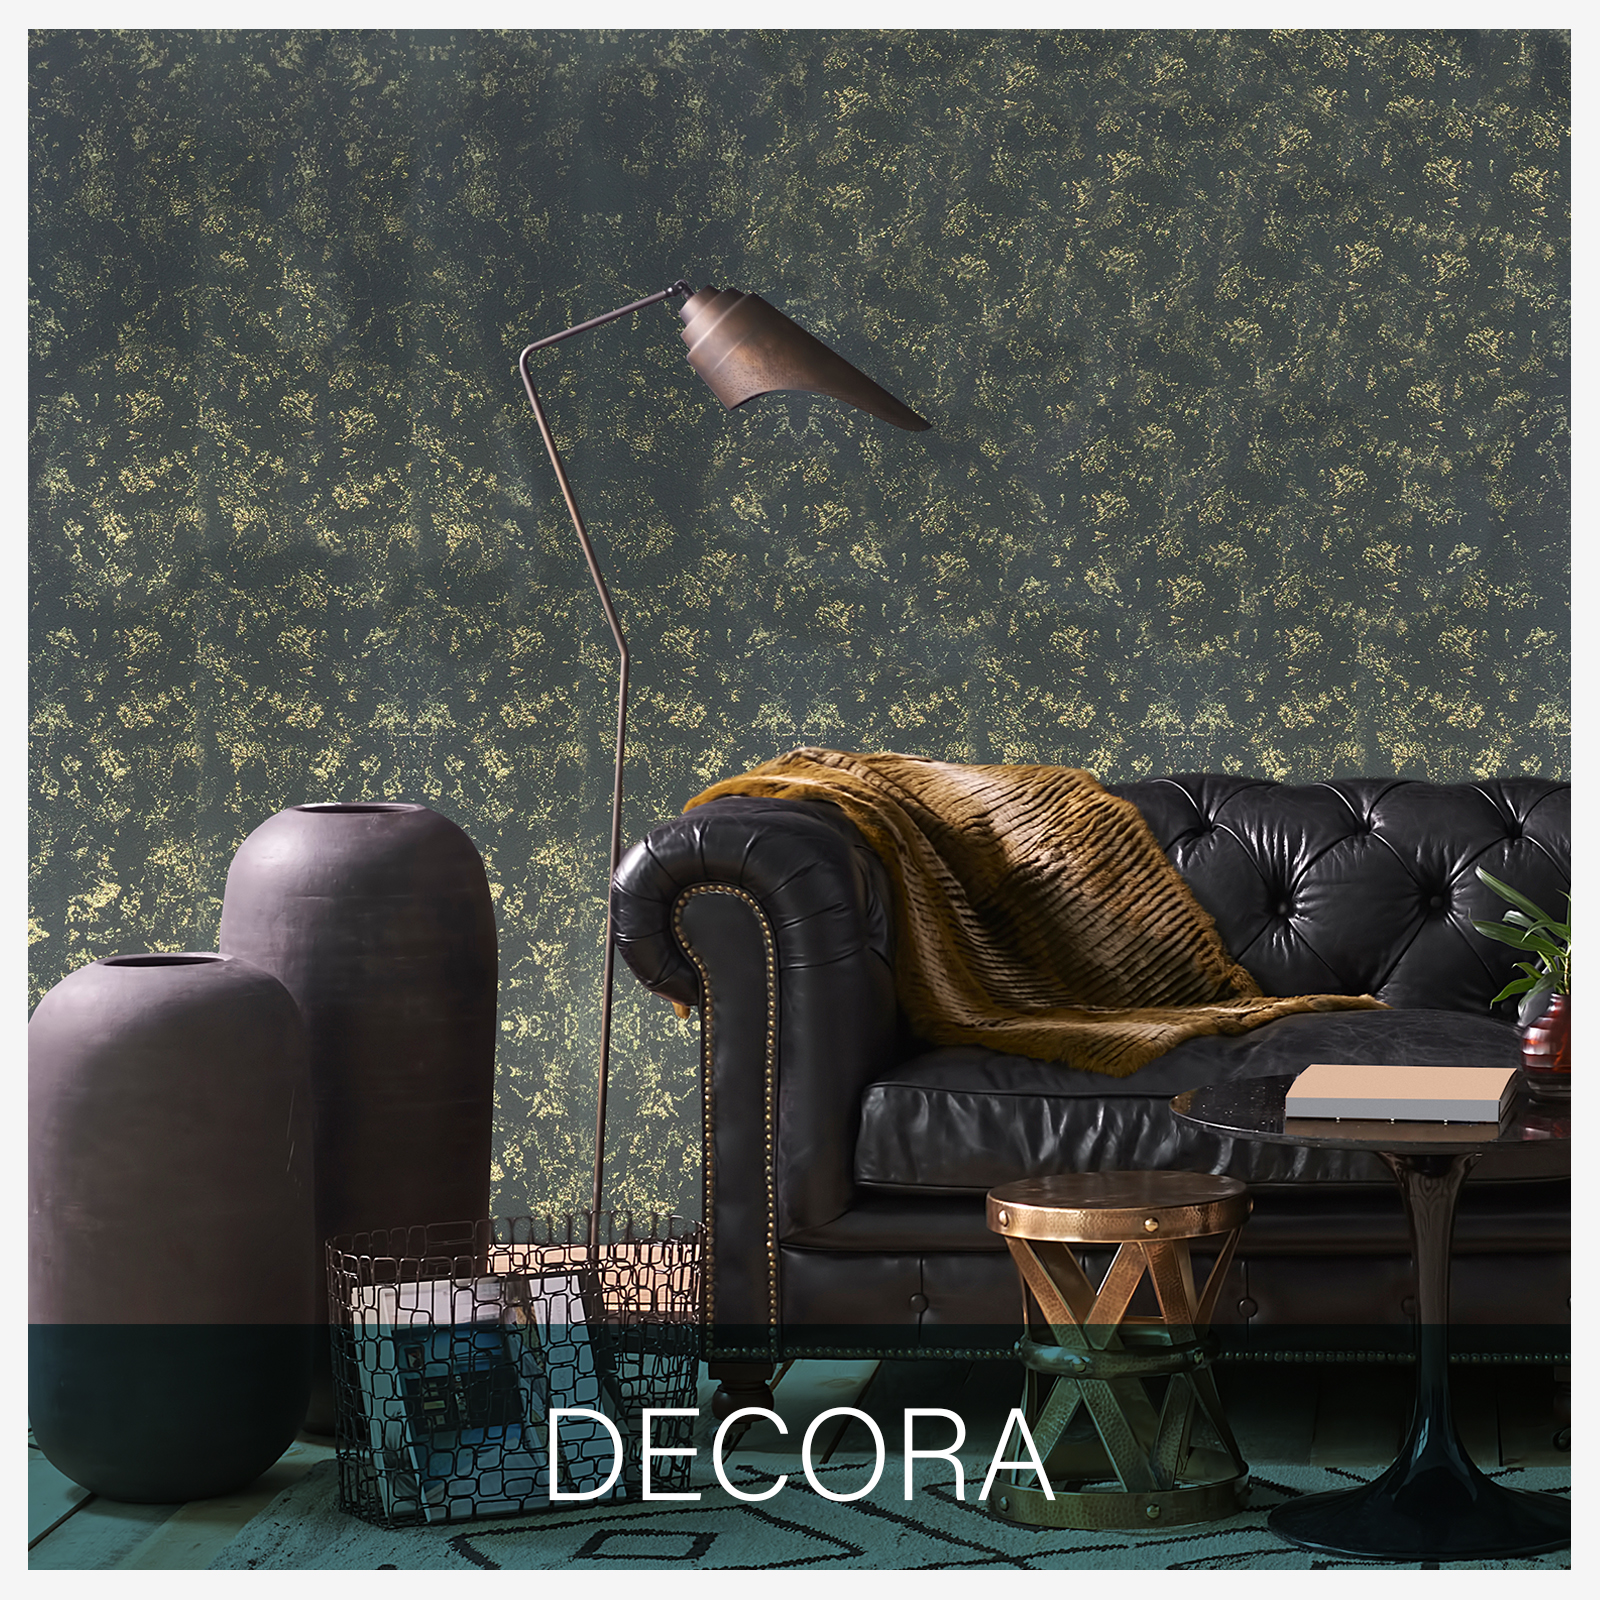 decora-tekst